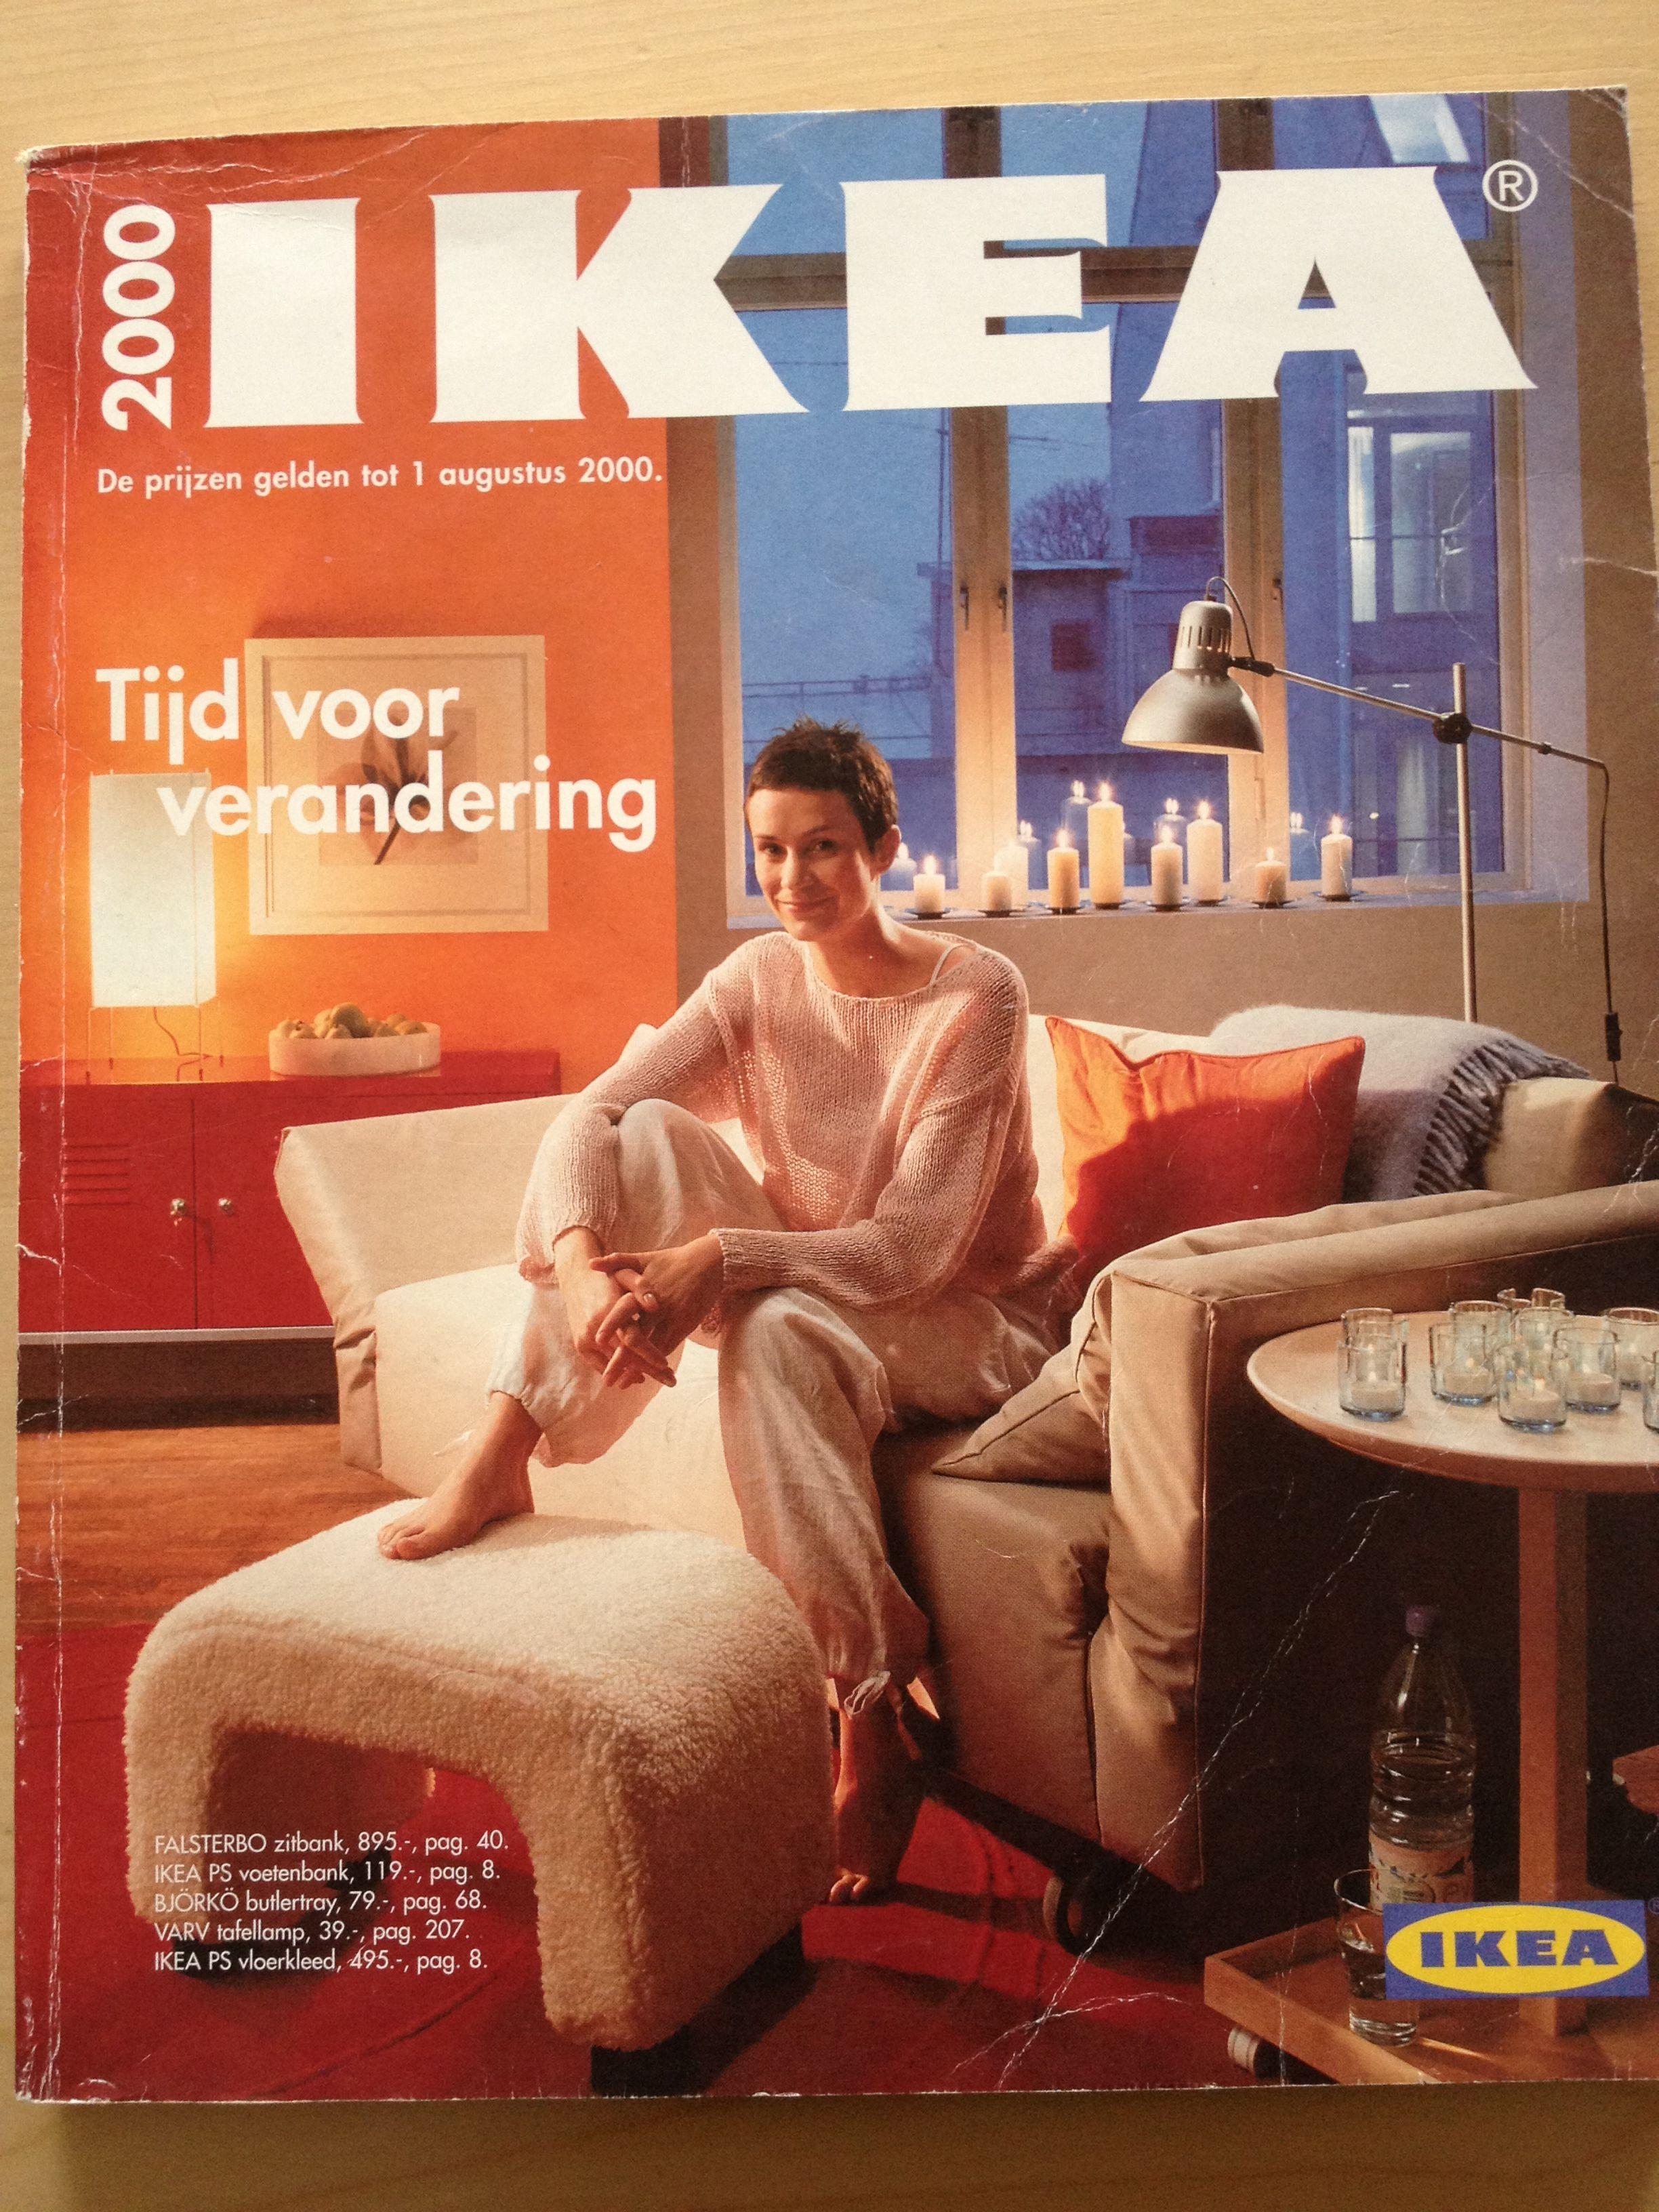 Ikea catalogue 2000 | Ikea catalog, Scan design, Ikea